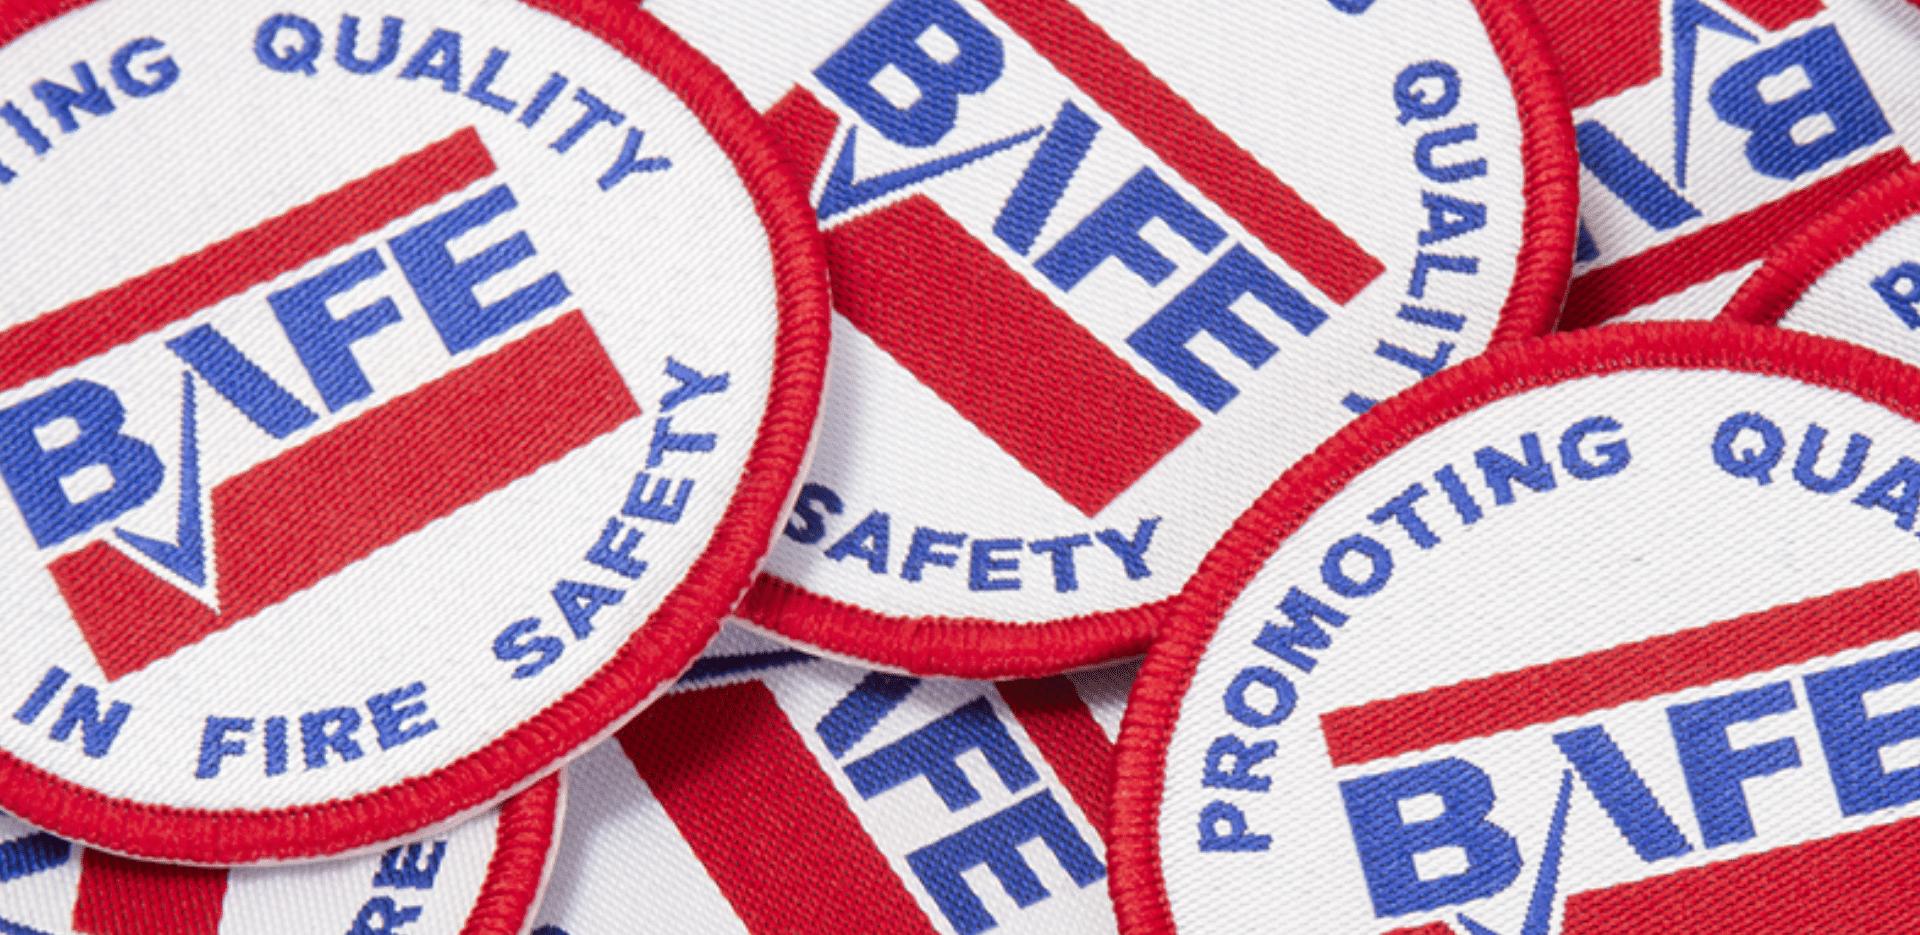 BAFE endorsed fire alarm installers